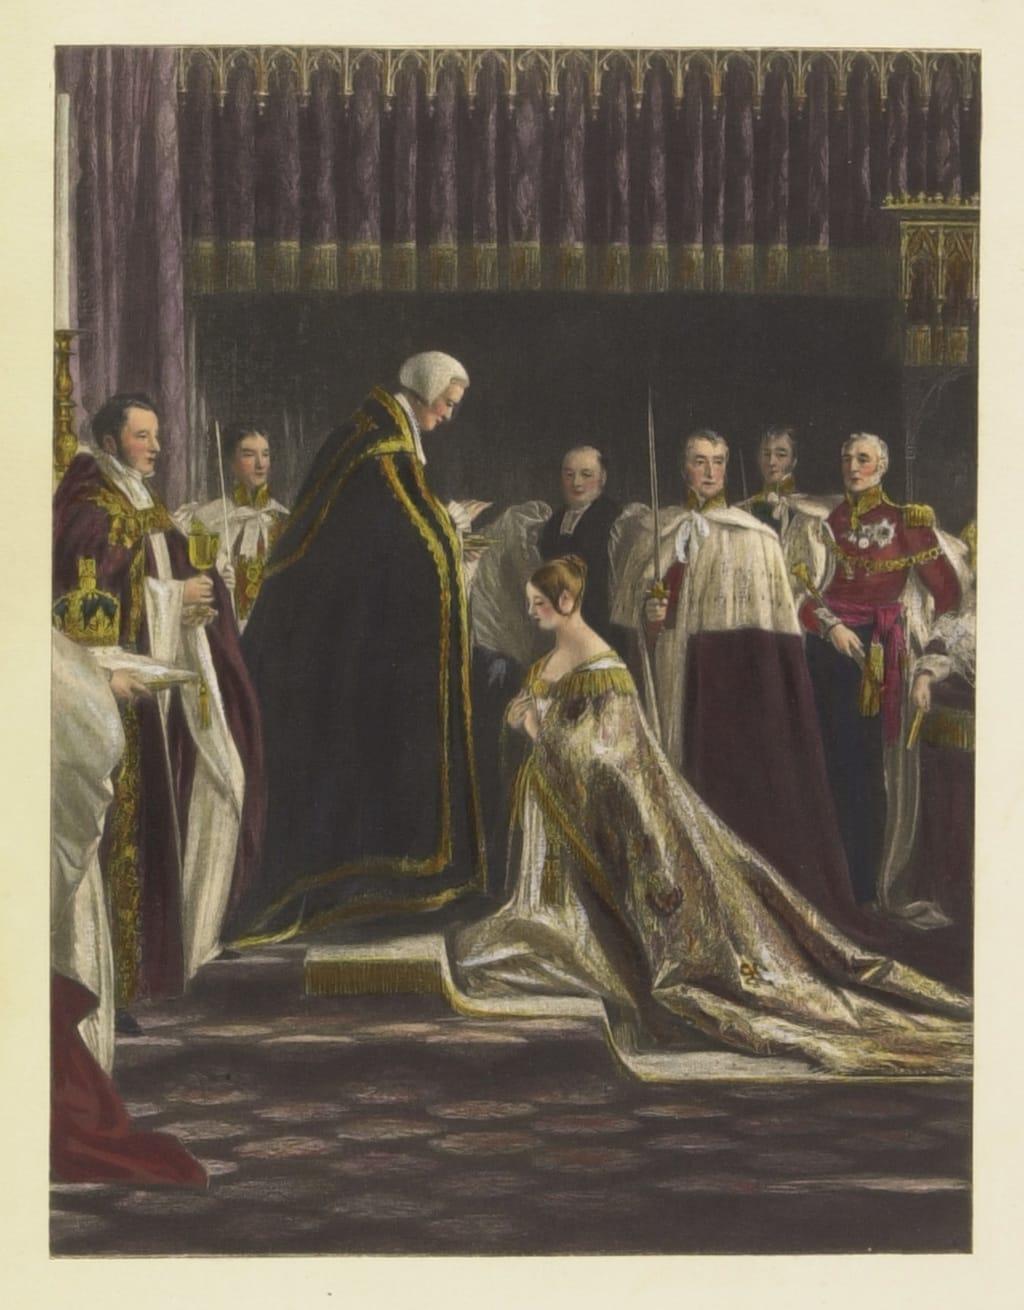 Le Sacre de la reine Victoria en 1837